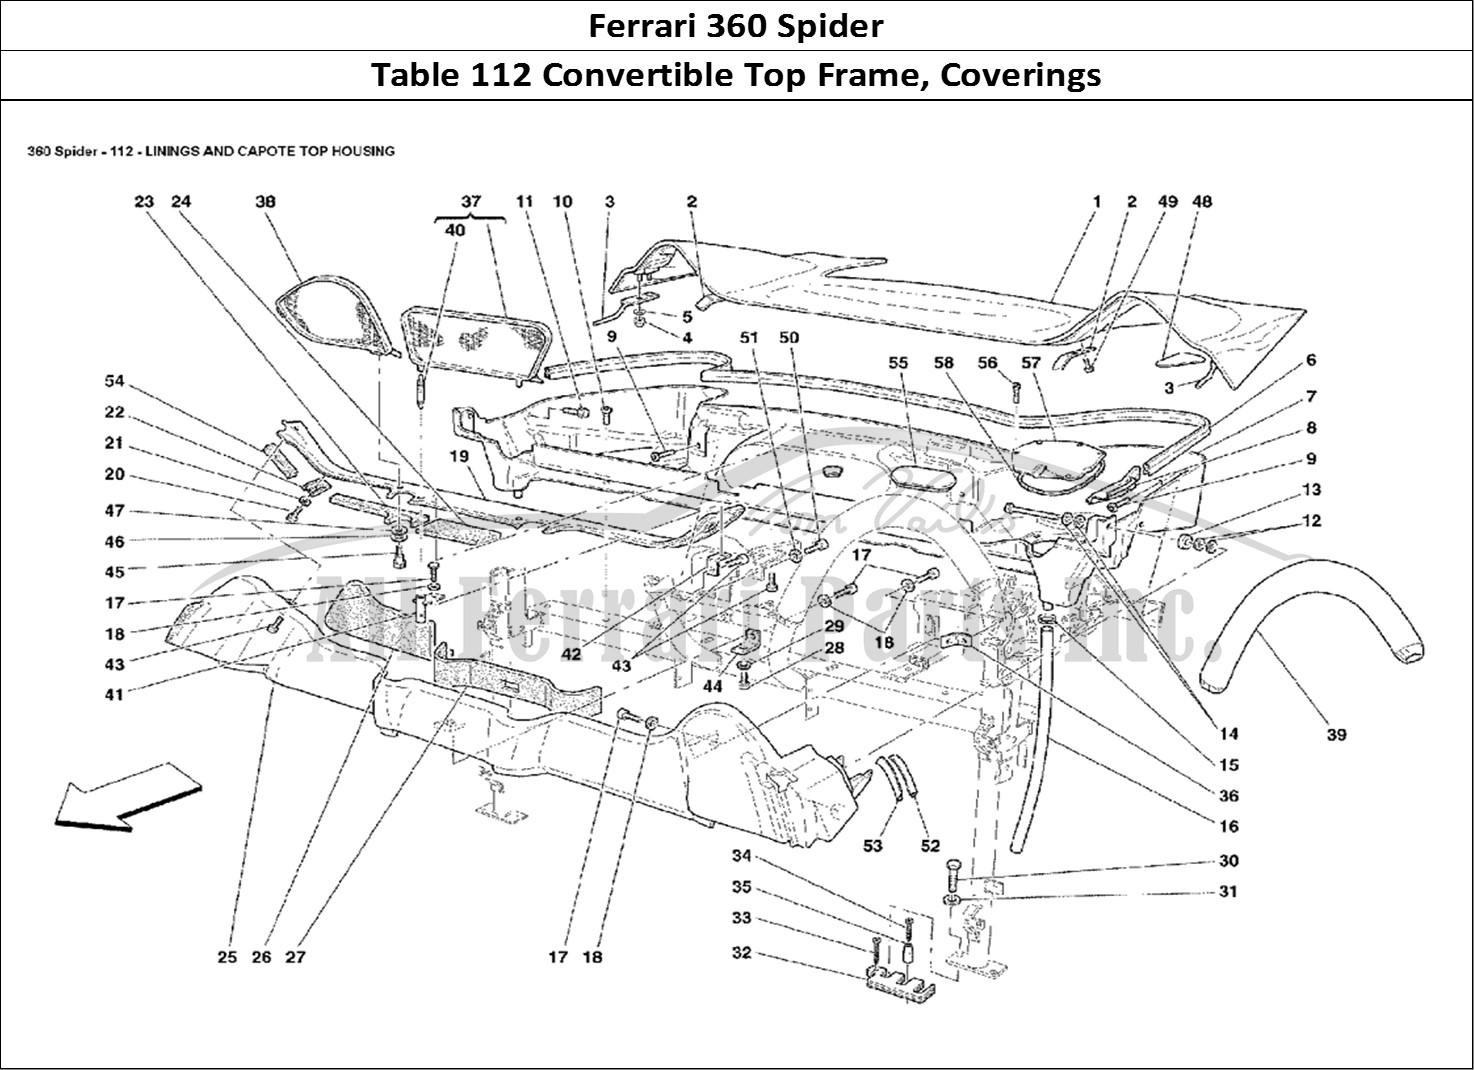 Buy Original Ferrari 360 Spider 112 Convertible Top Frame